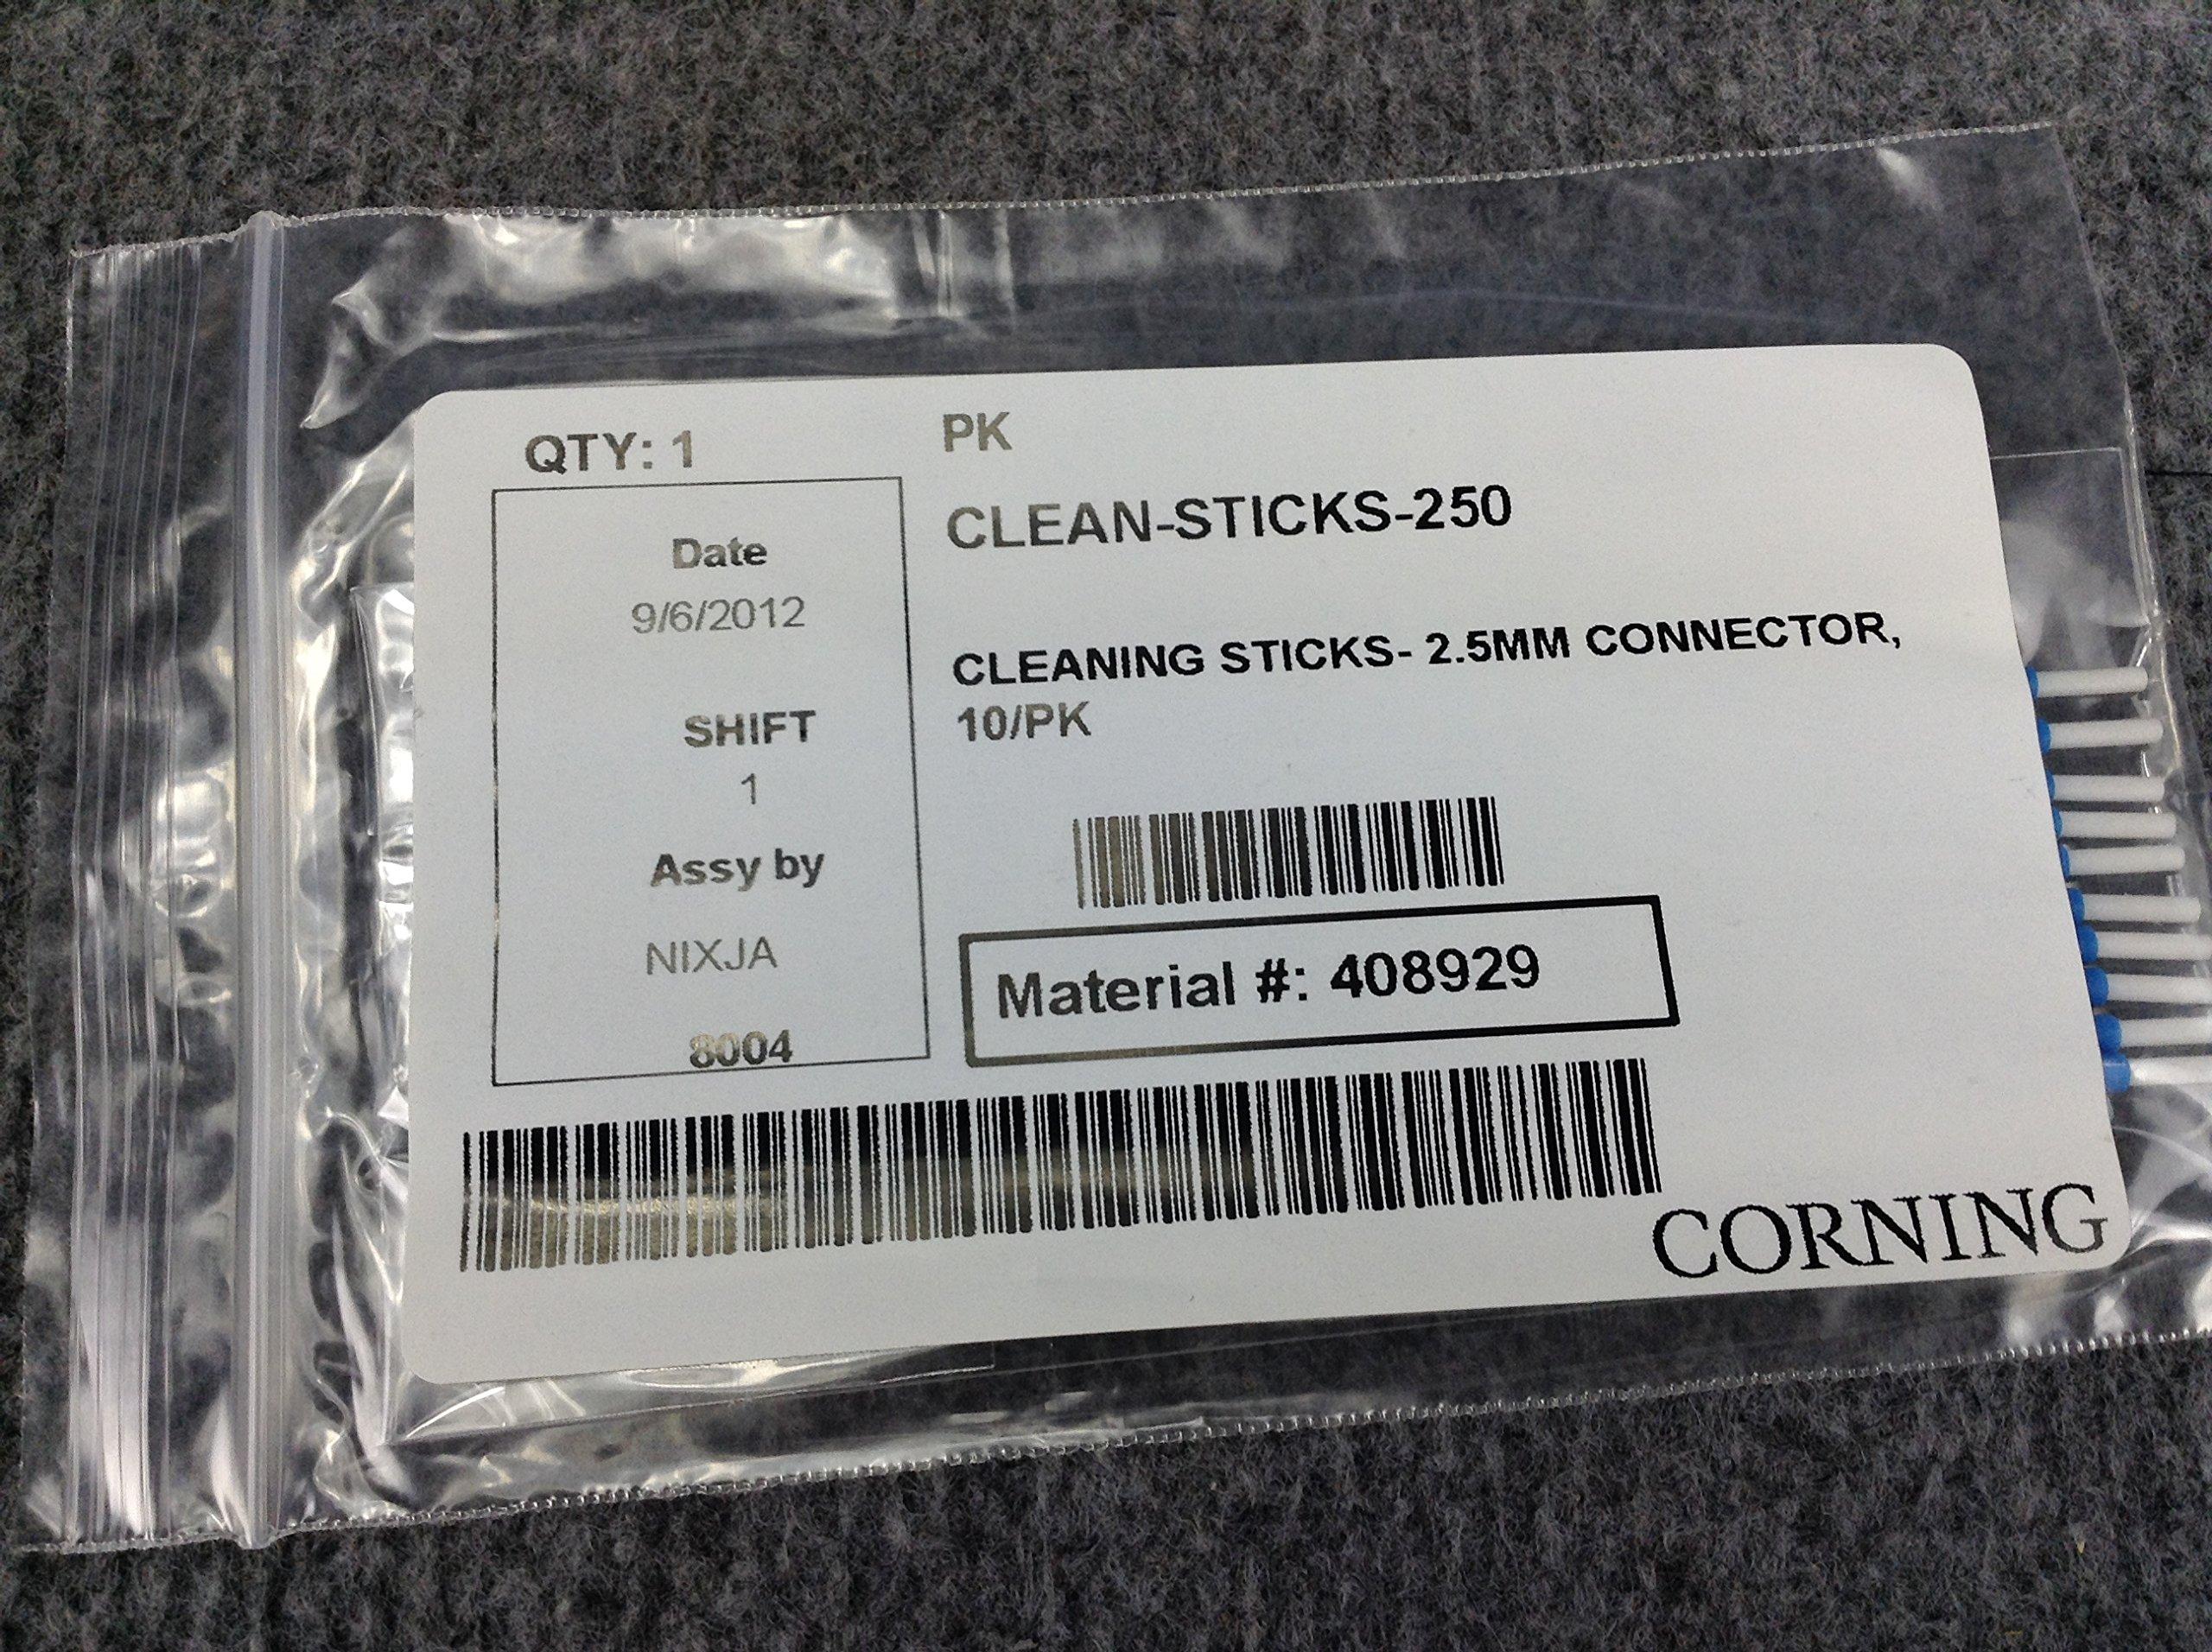 Corning Clean-Sticks-250 Fiber Optic Cleaning Sticks 2.5 Mm 10/Pack (TP)